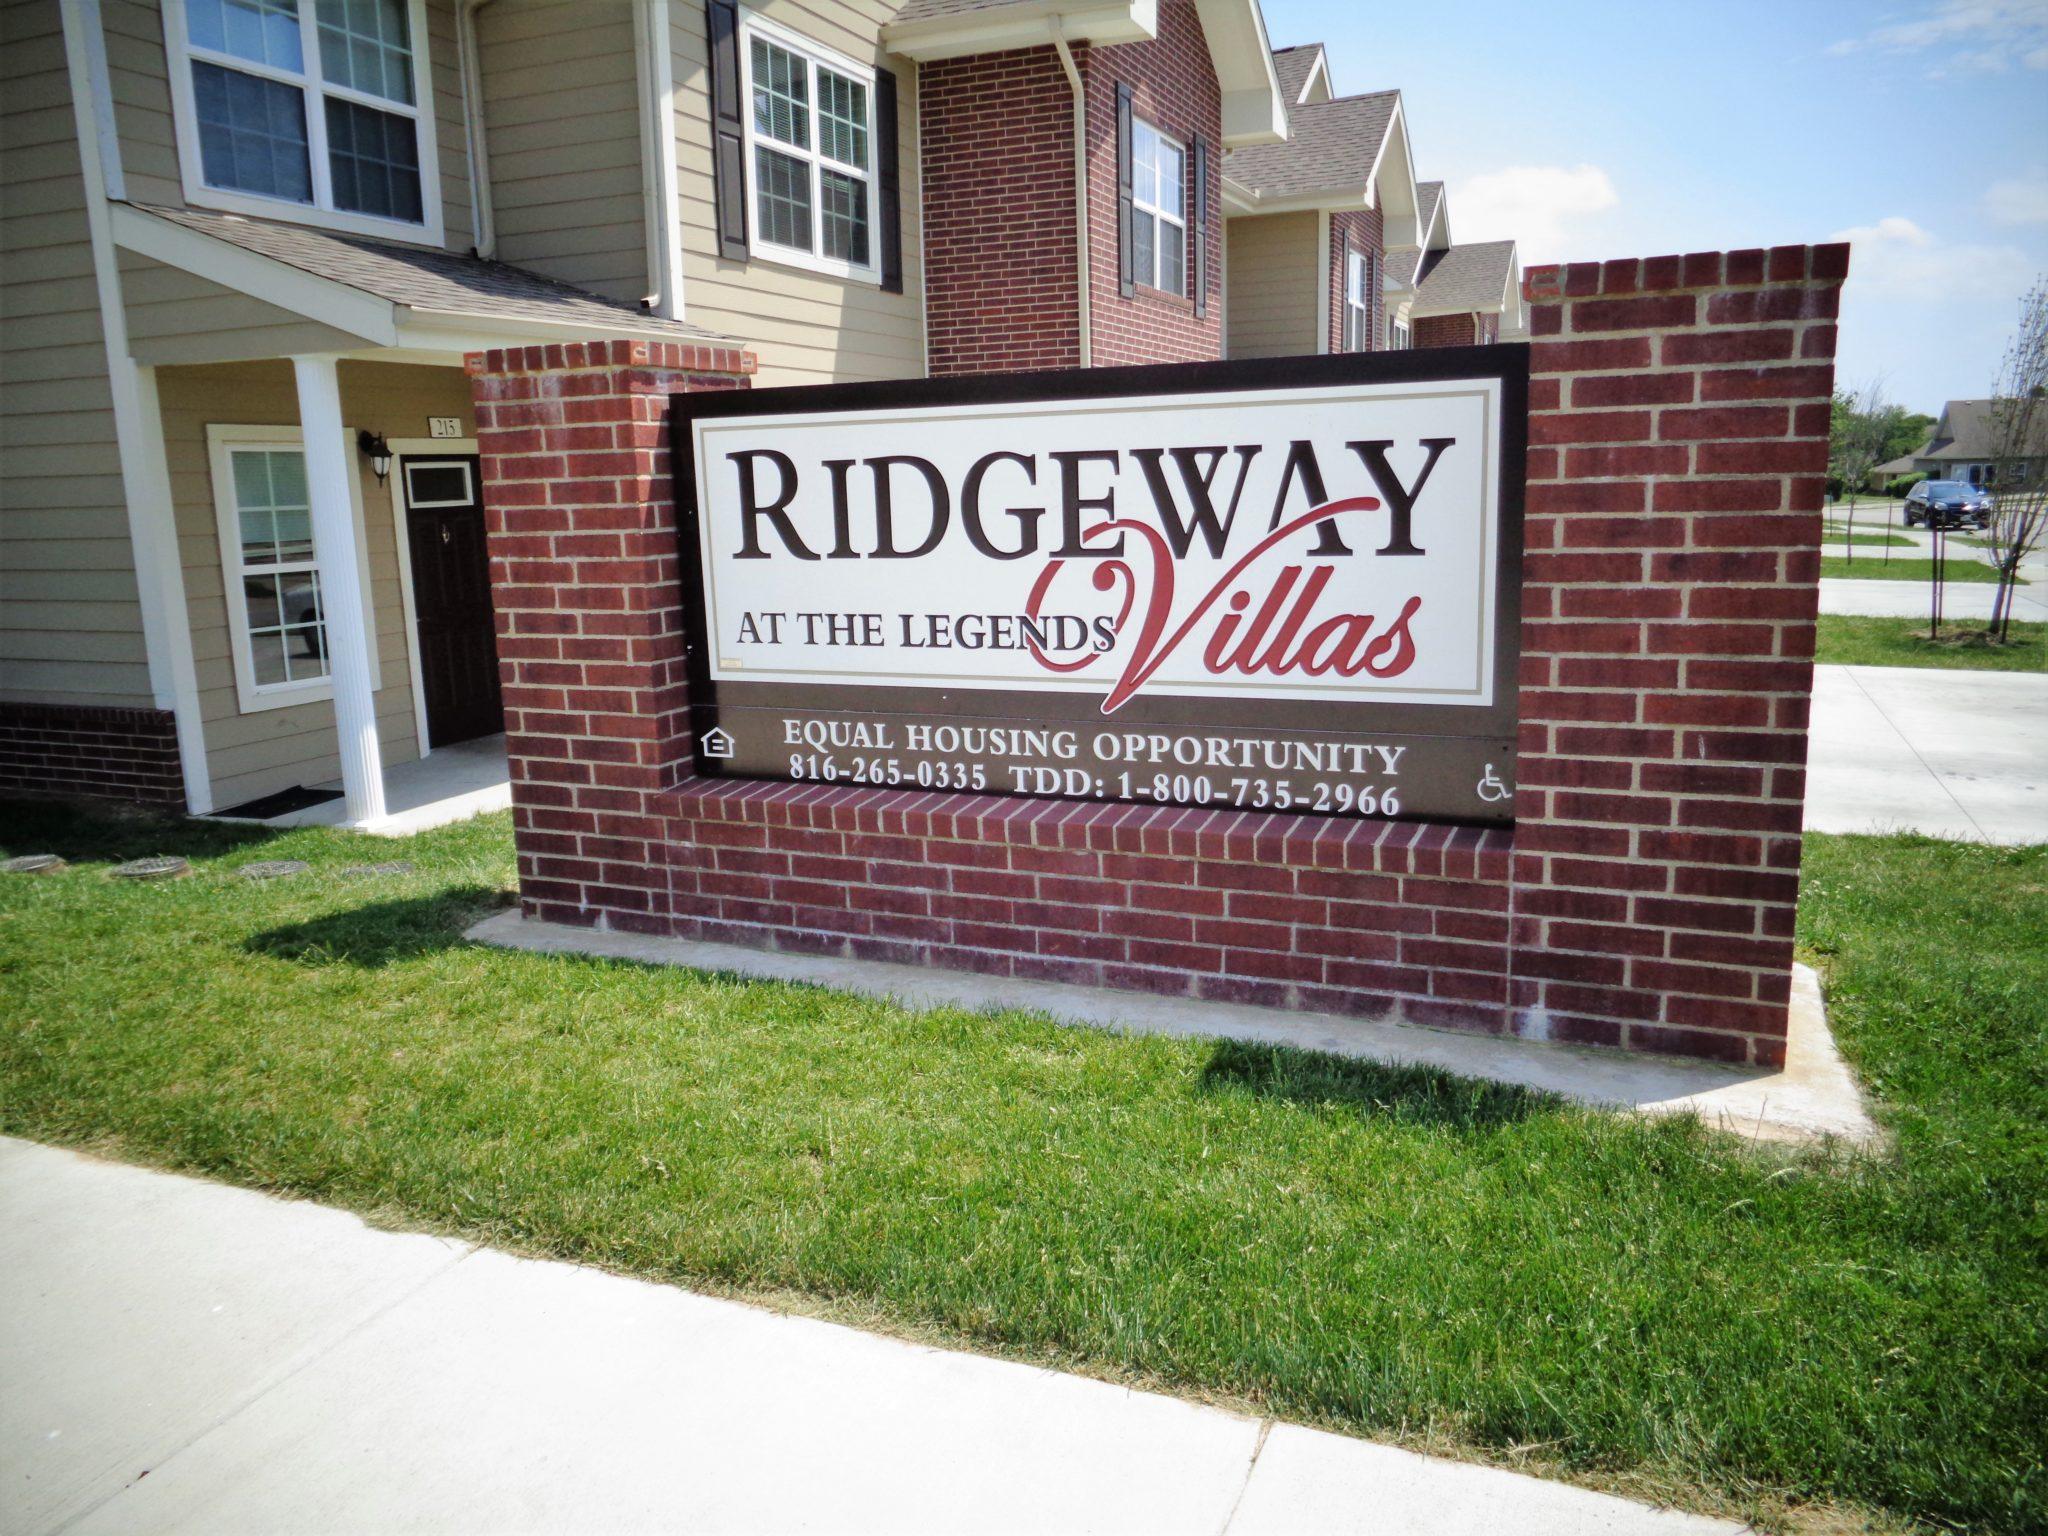 Ridgeway Villas Raymore MO sign